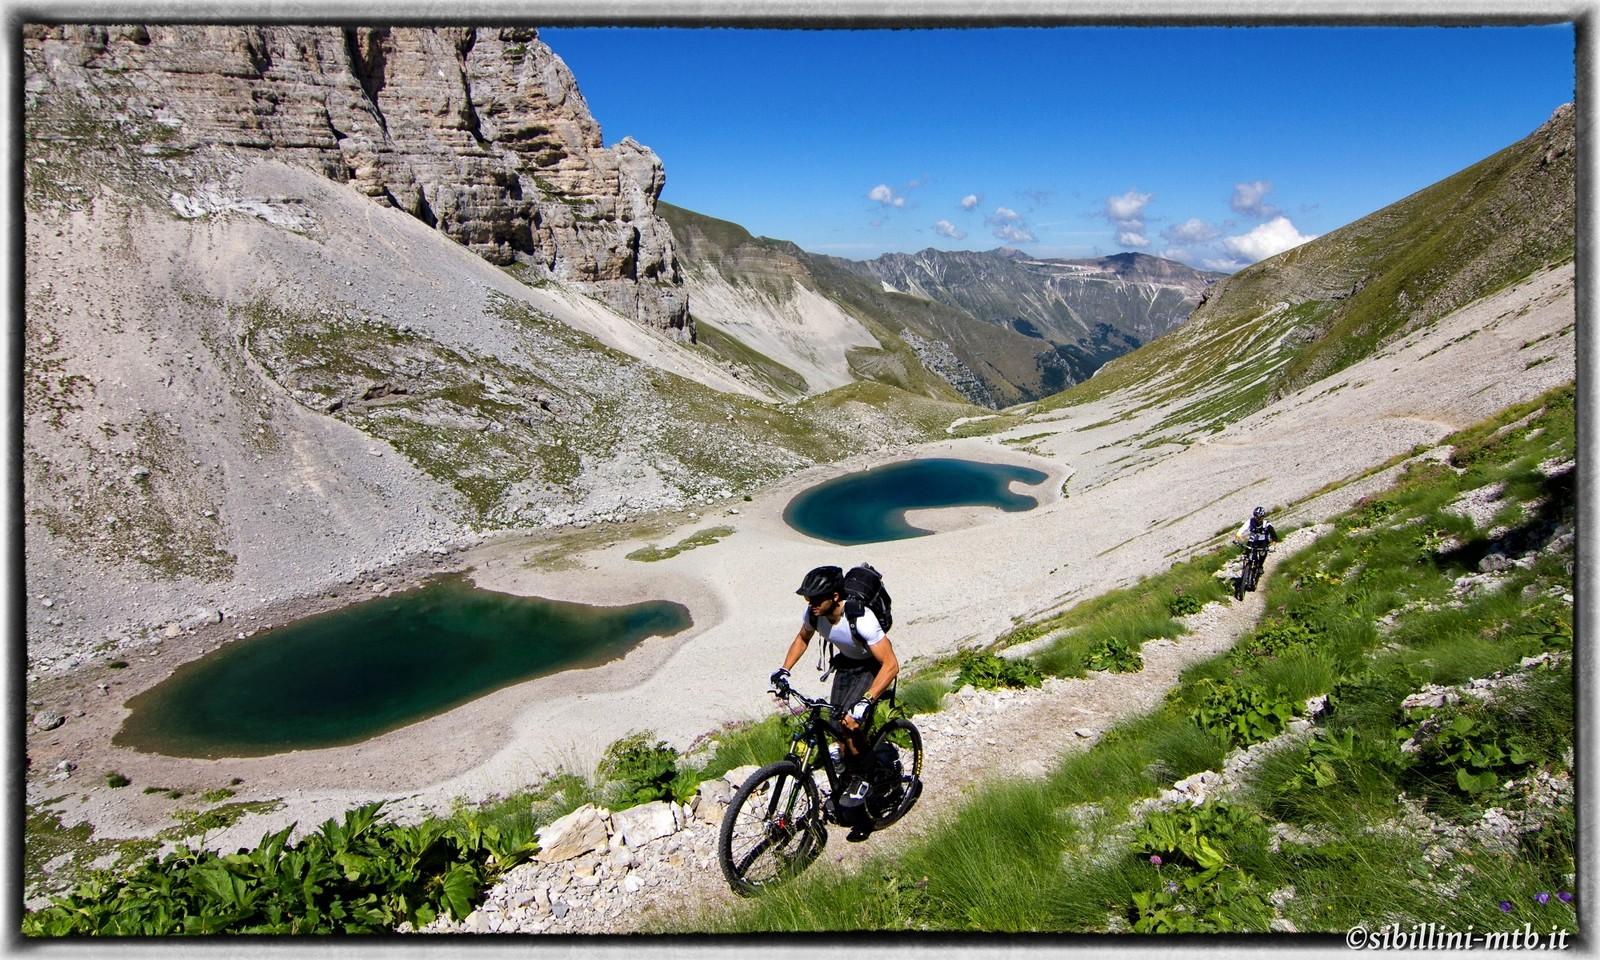 Laghi di Pilato - barbonis - Mountain Biking Pictures - Vital MTB